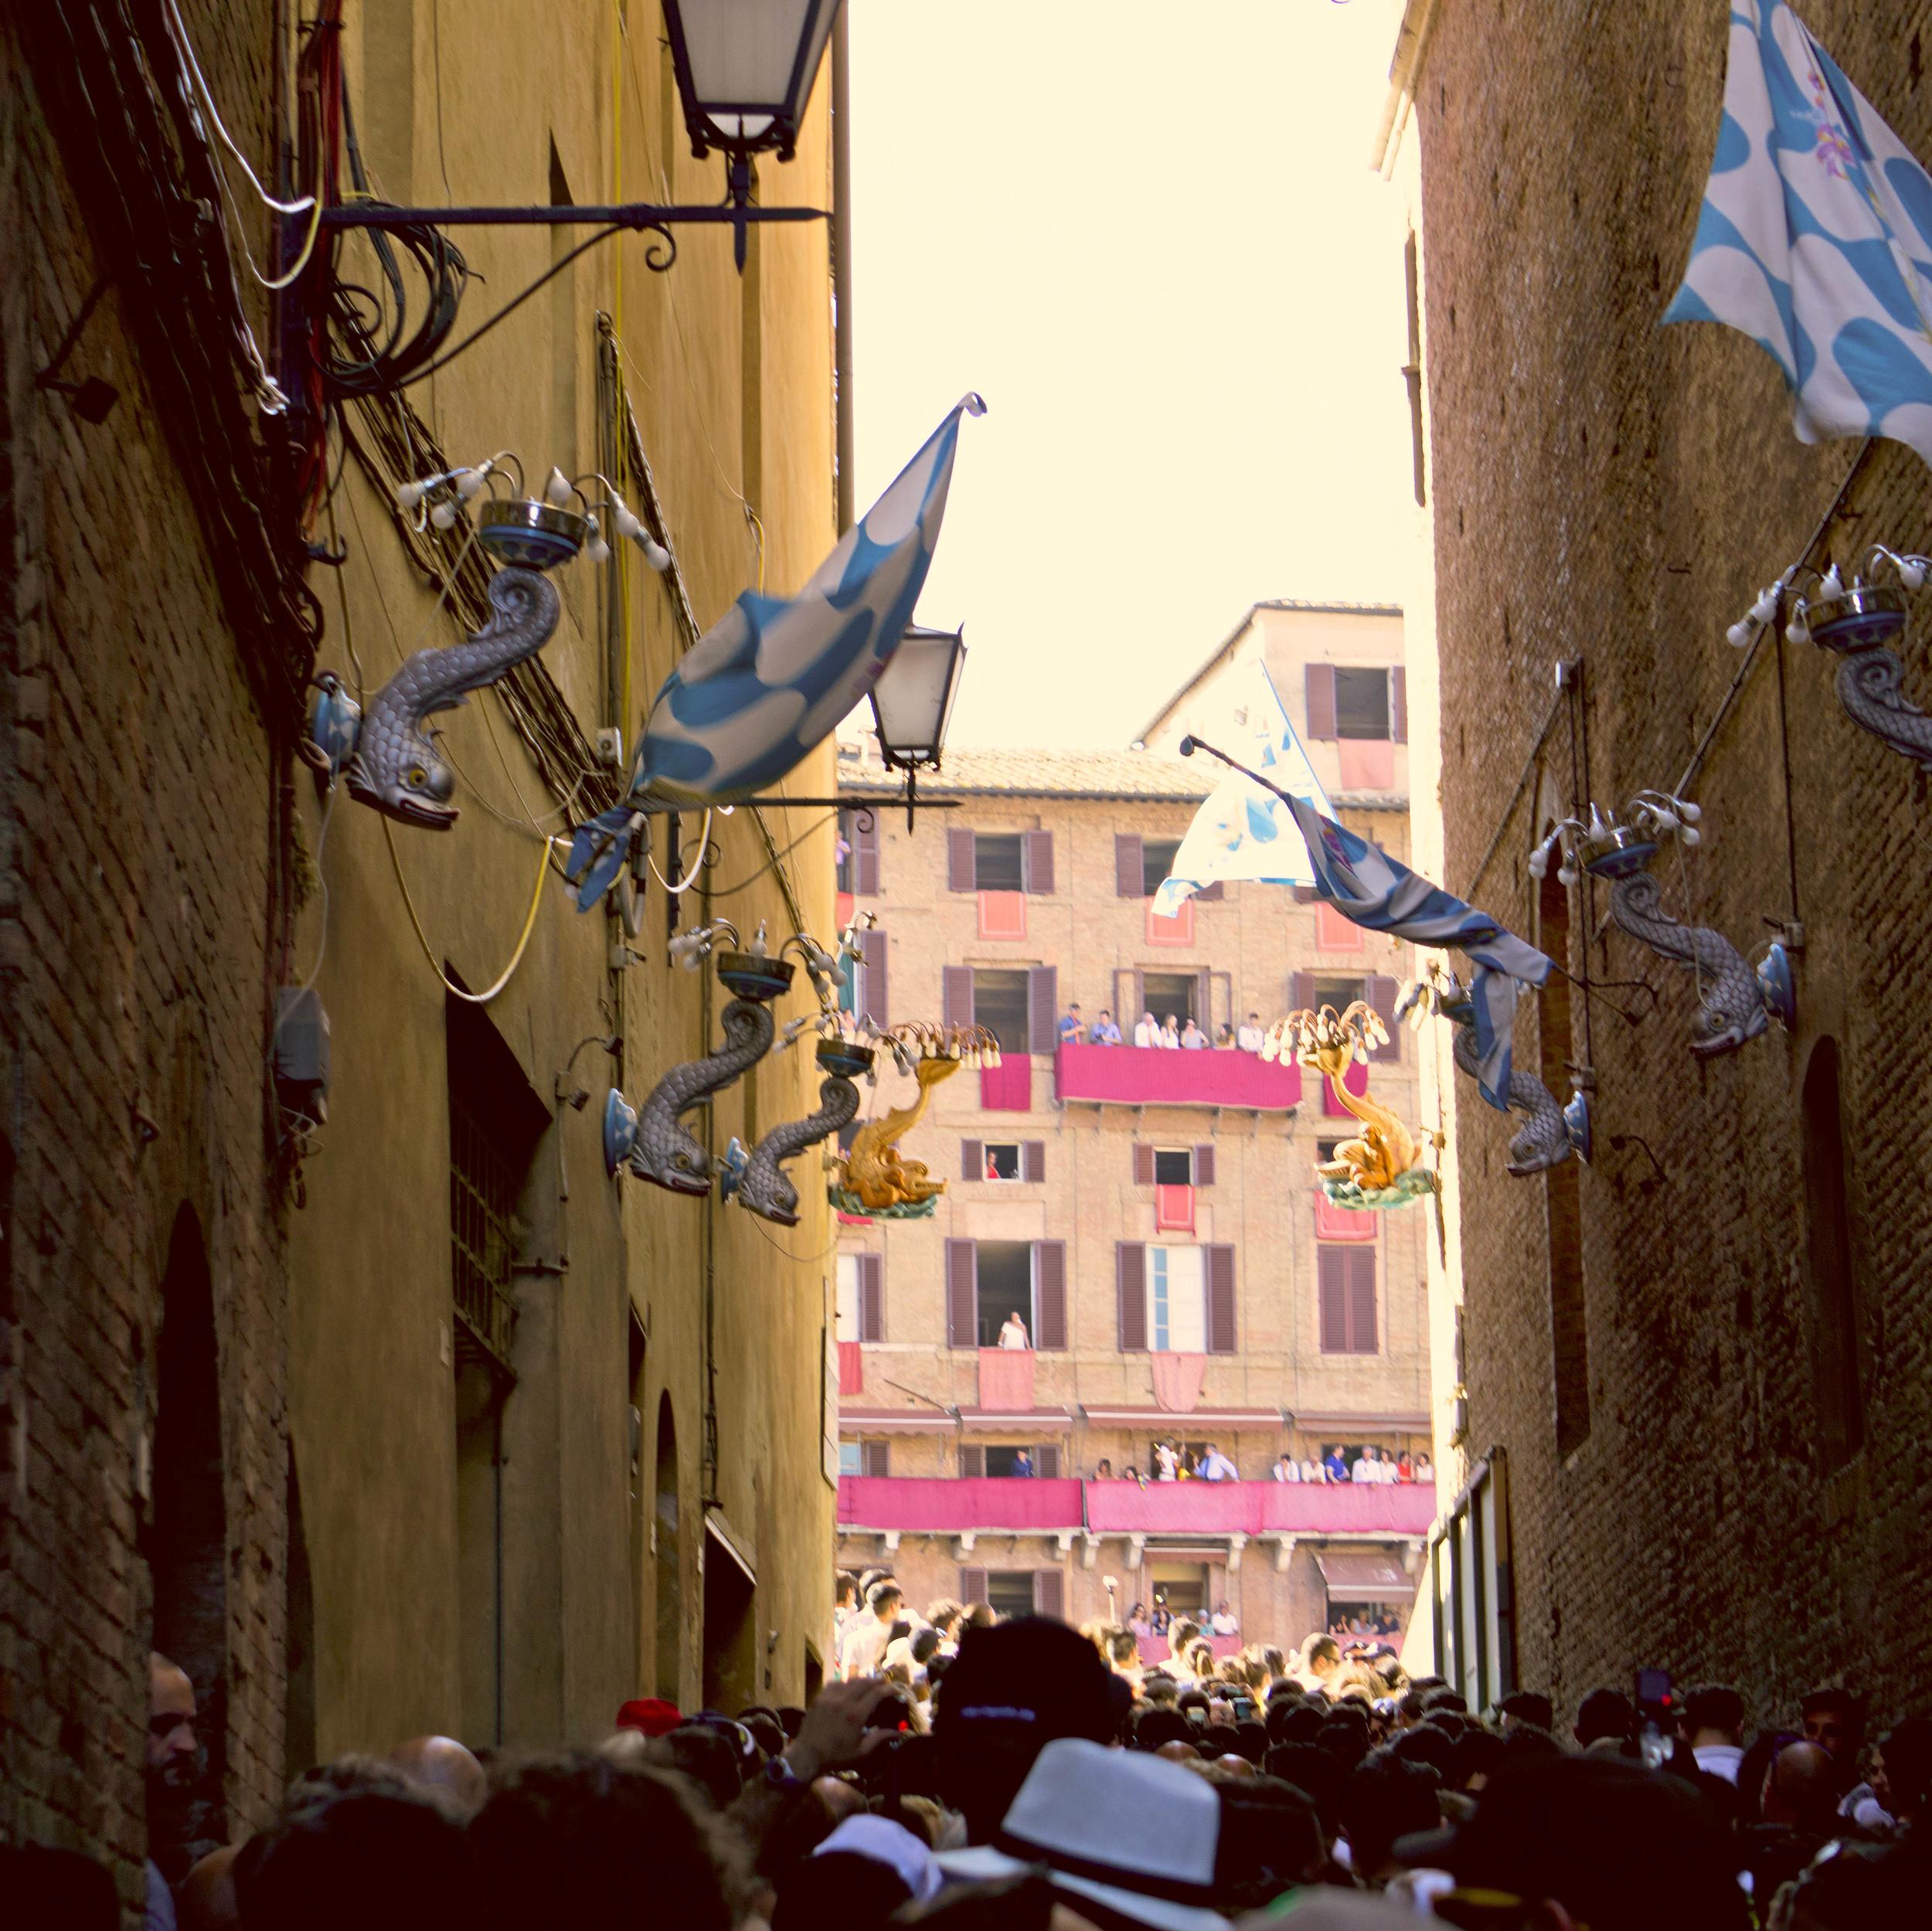 Entering the Piazza del Campo